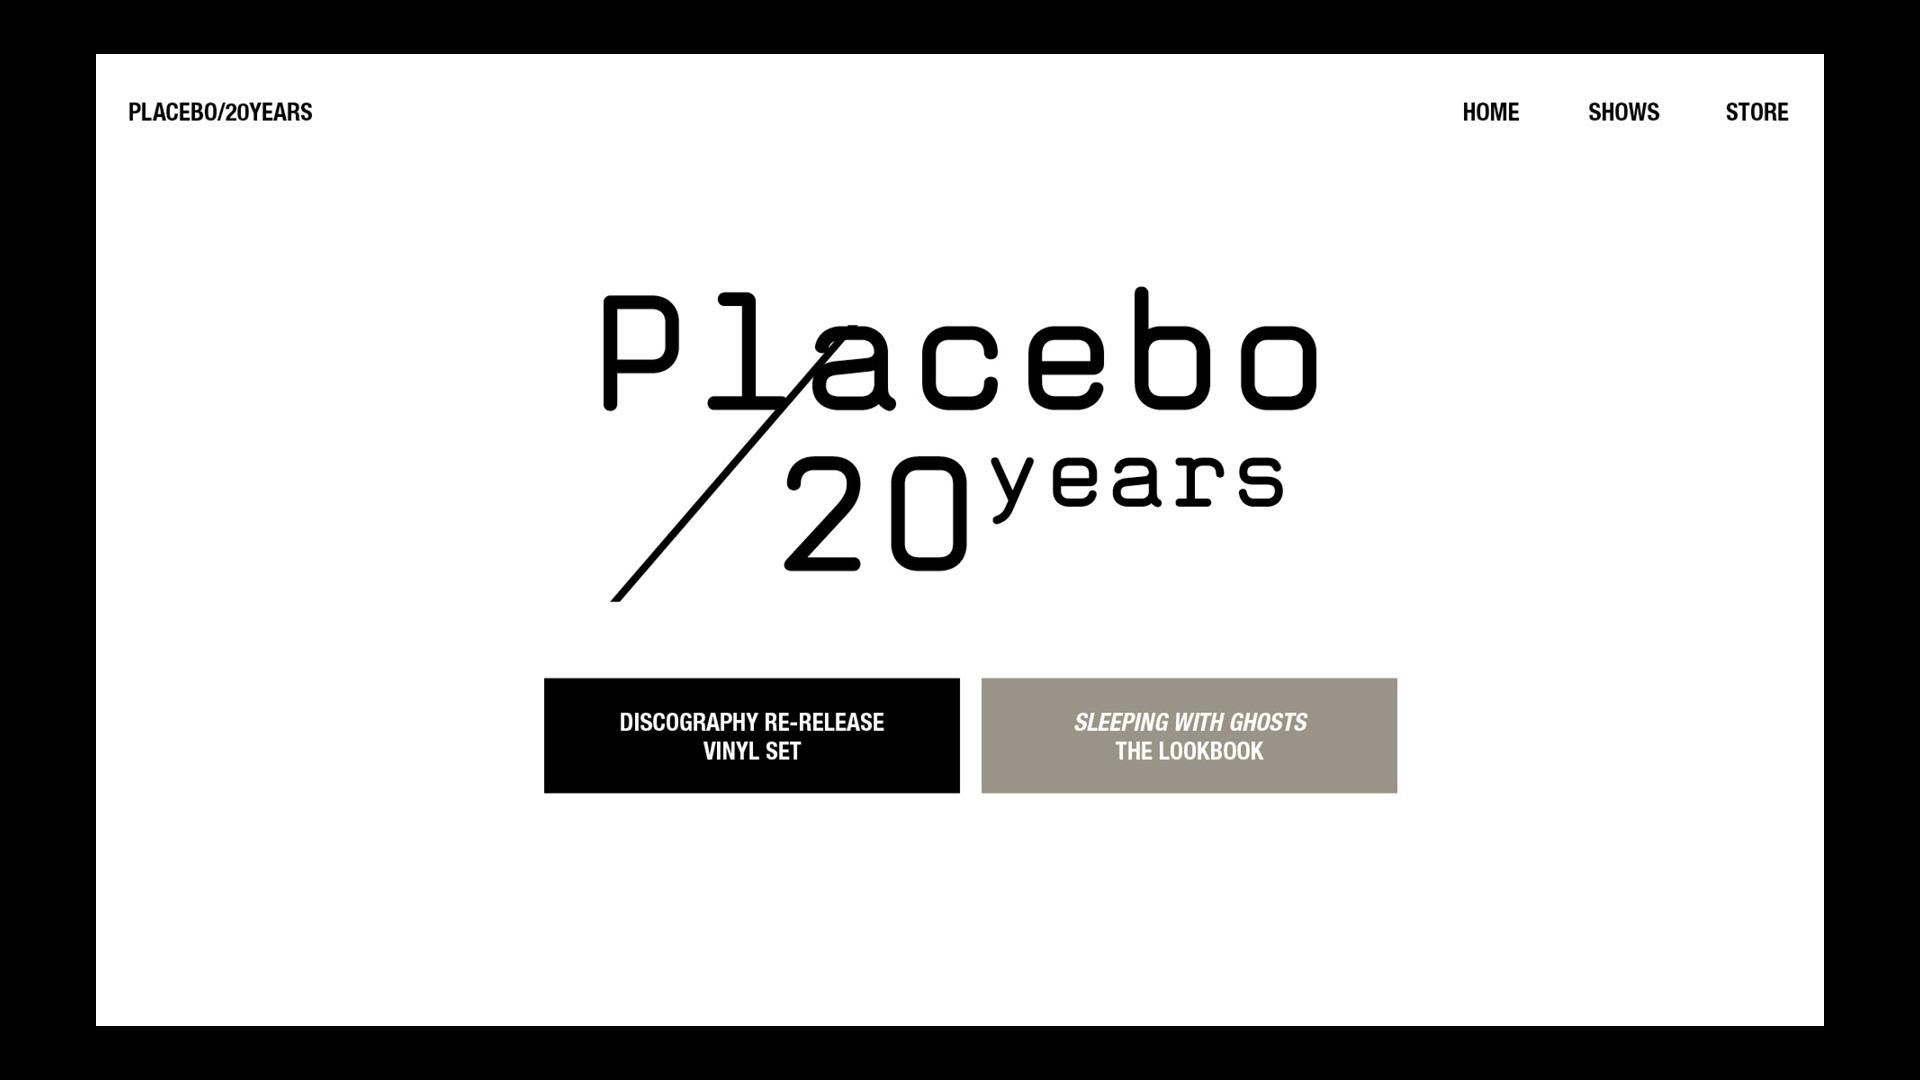 placebo_web2.jpg